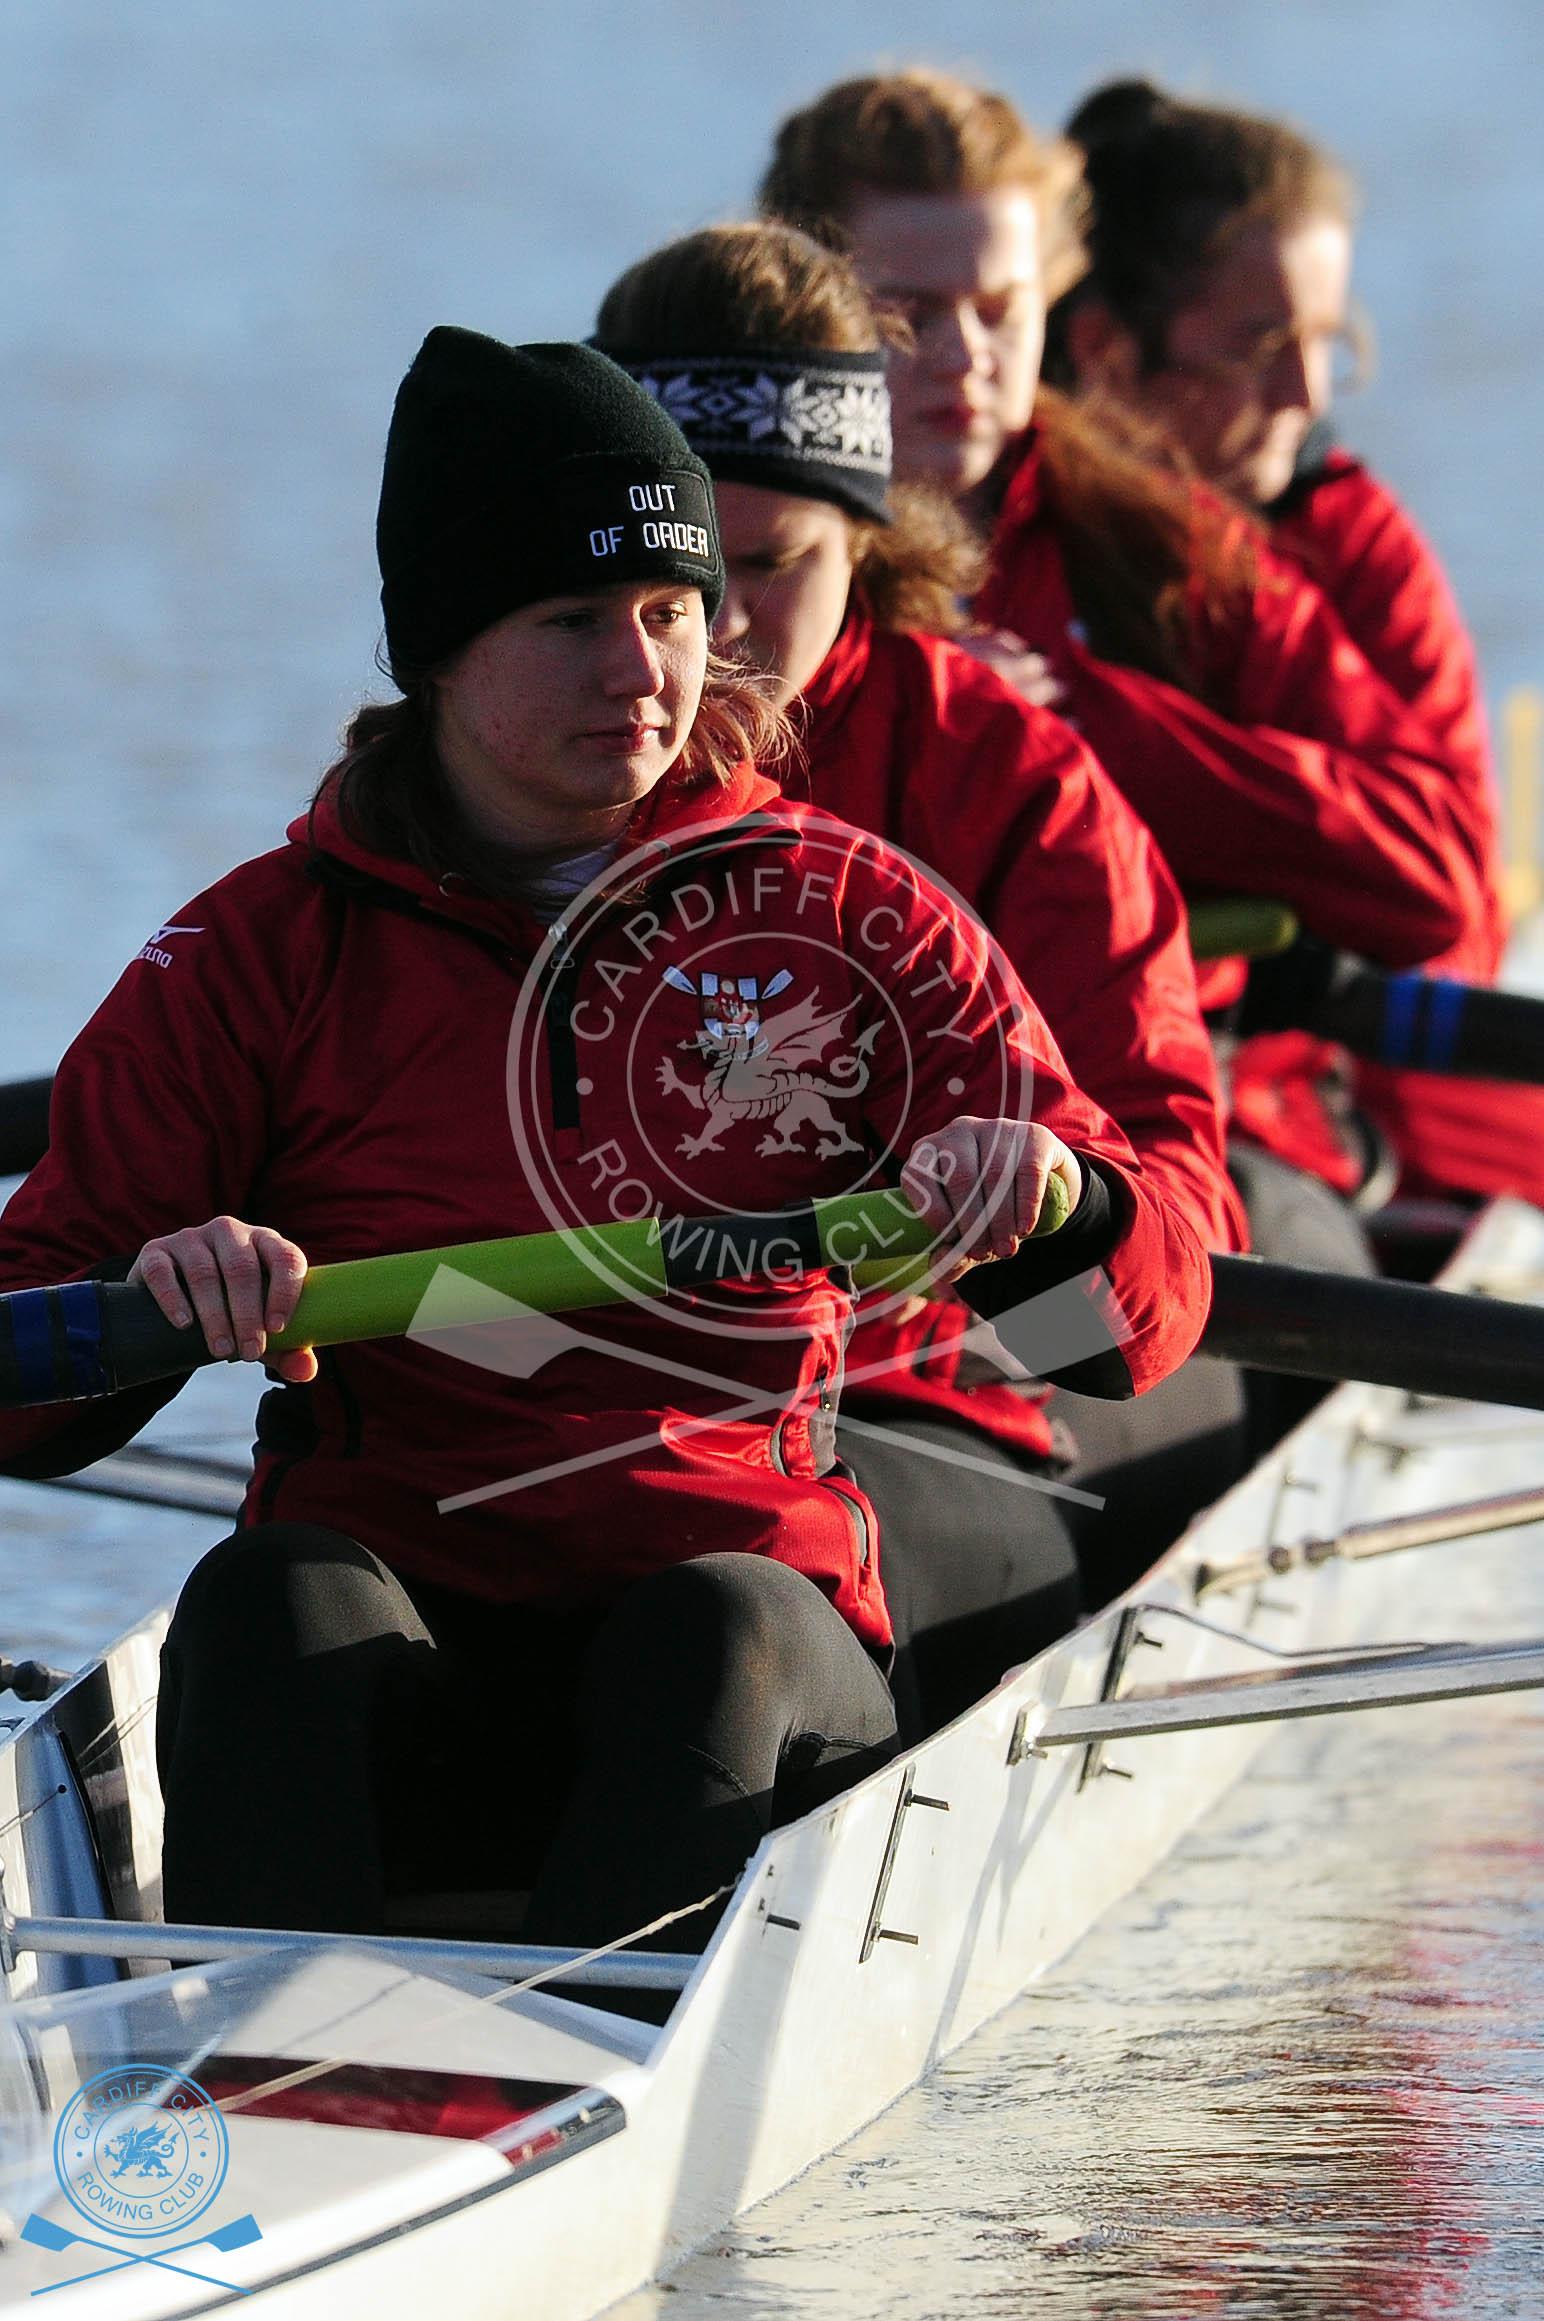 DW_280119_Cardiff_City_Rowing_10.jpg